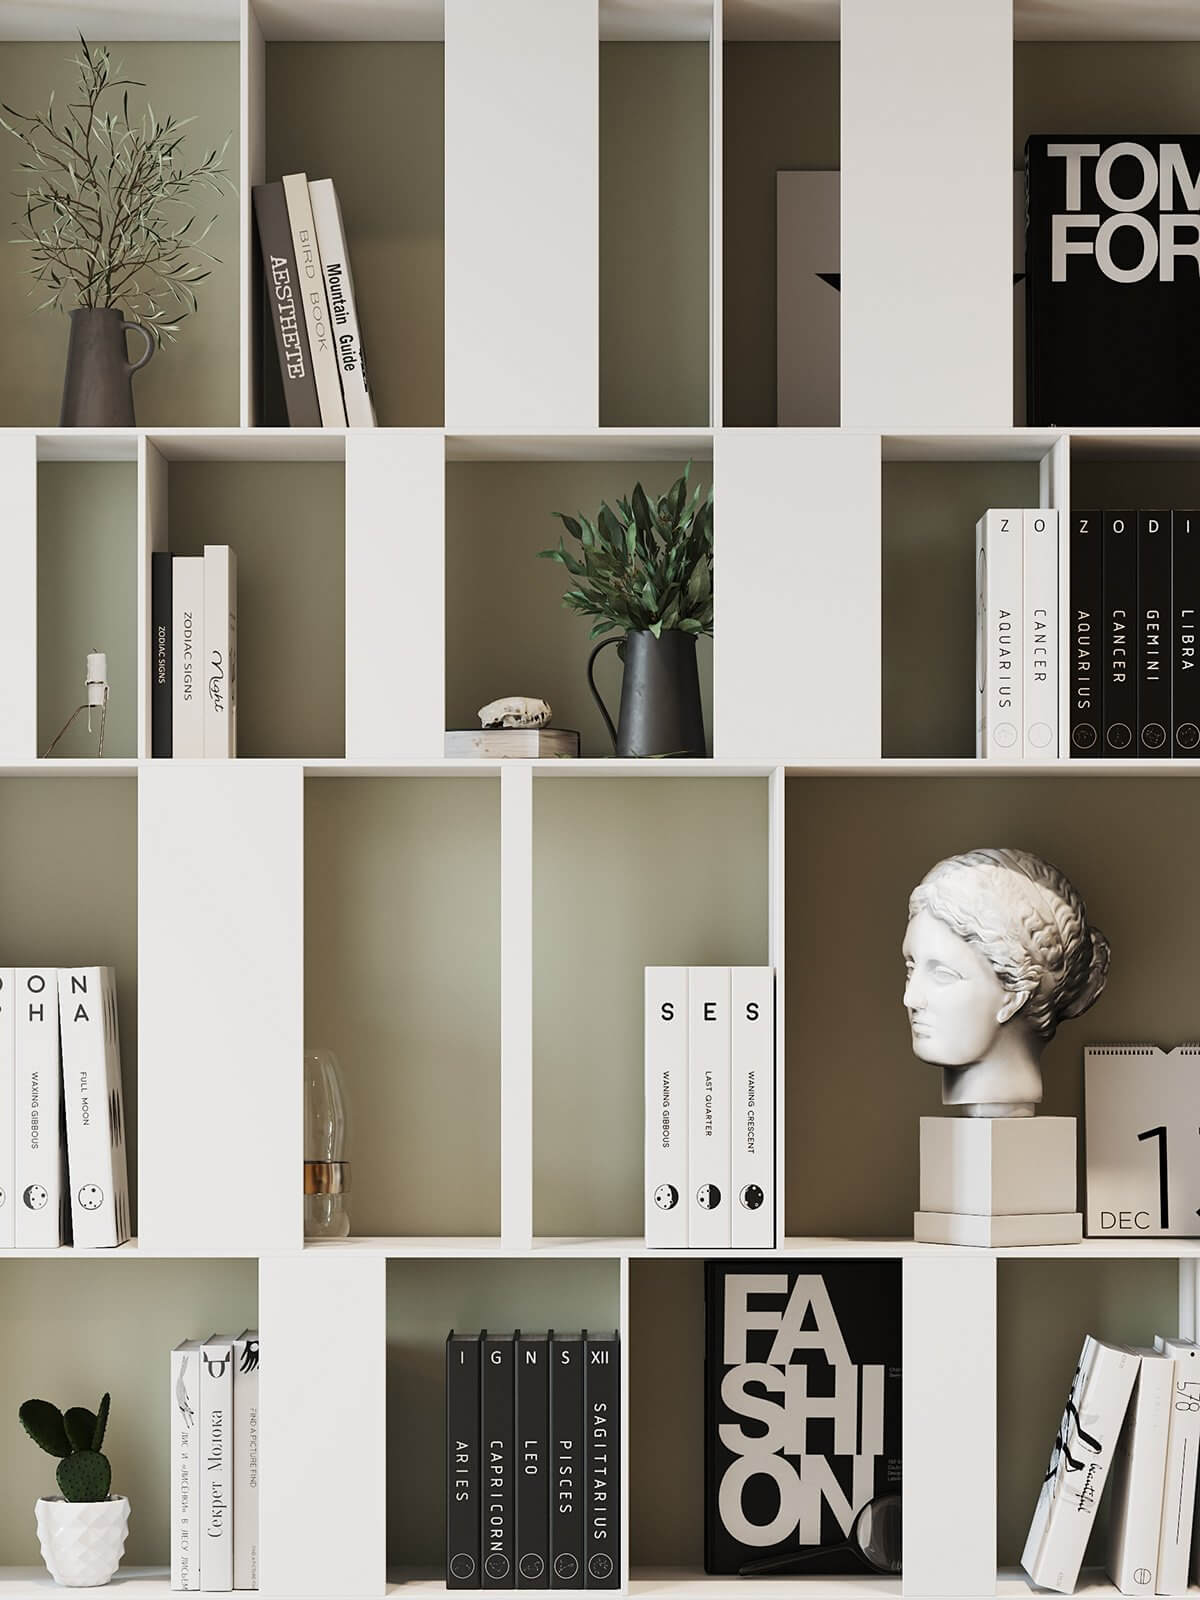 Apartment Presnya City Moscow living room bookshelf detail books - cgi visualization